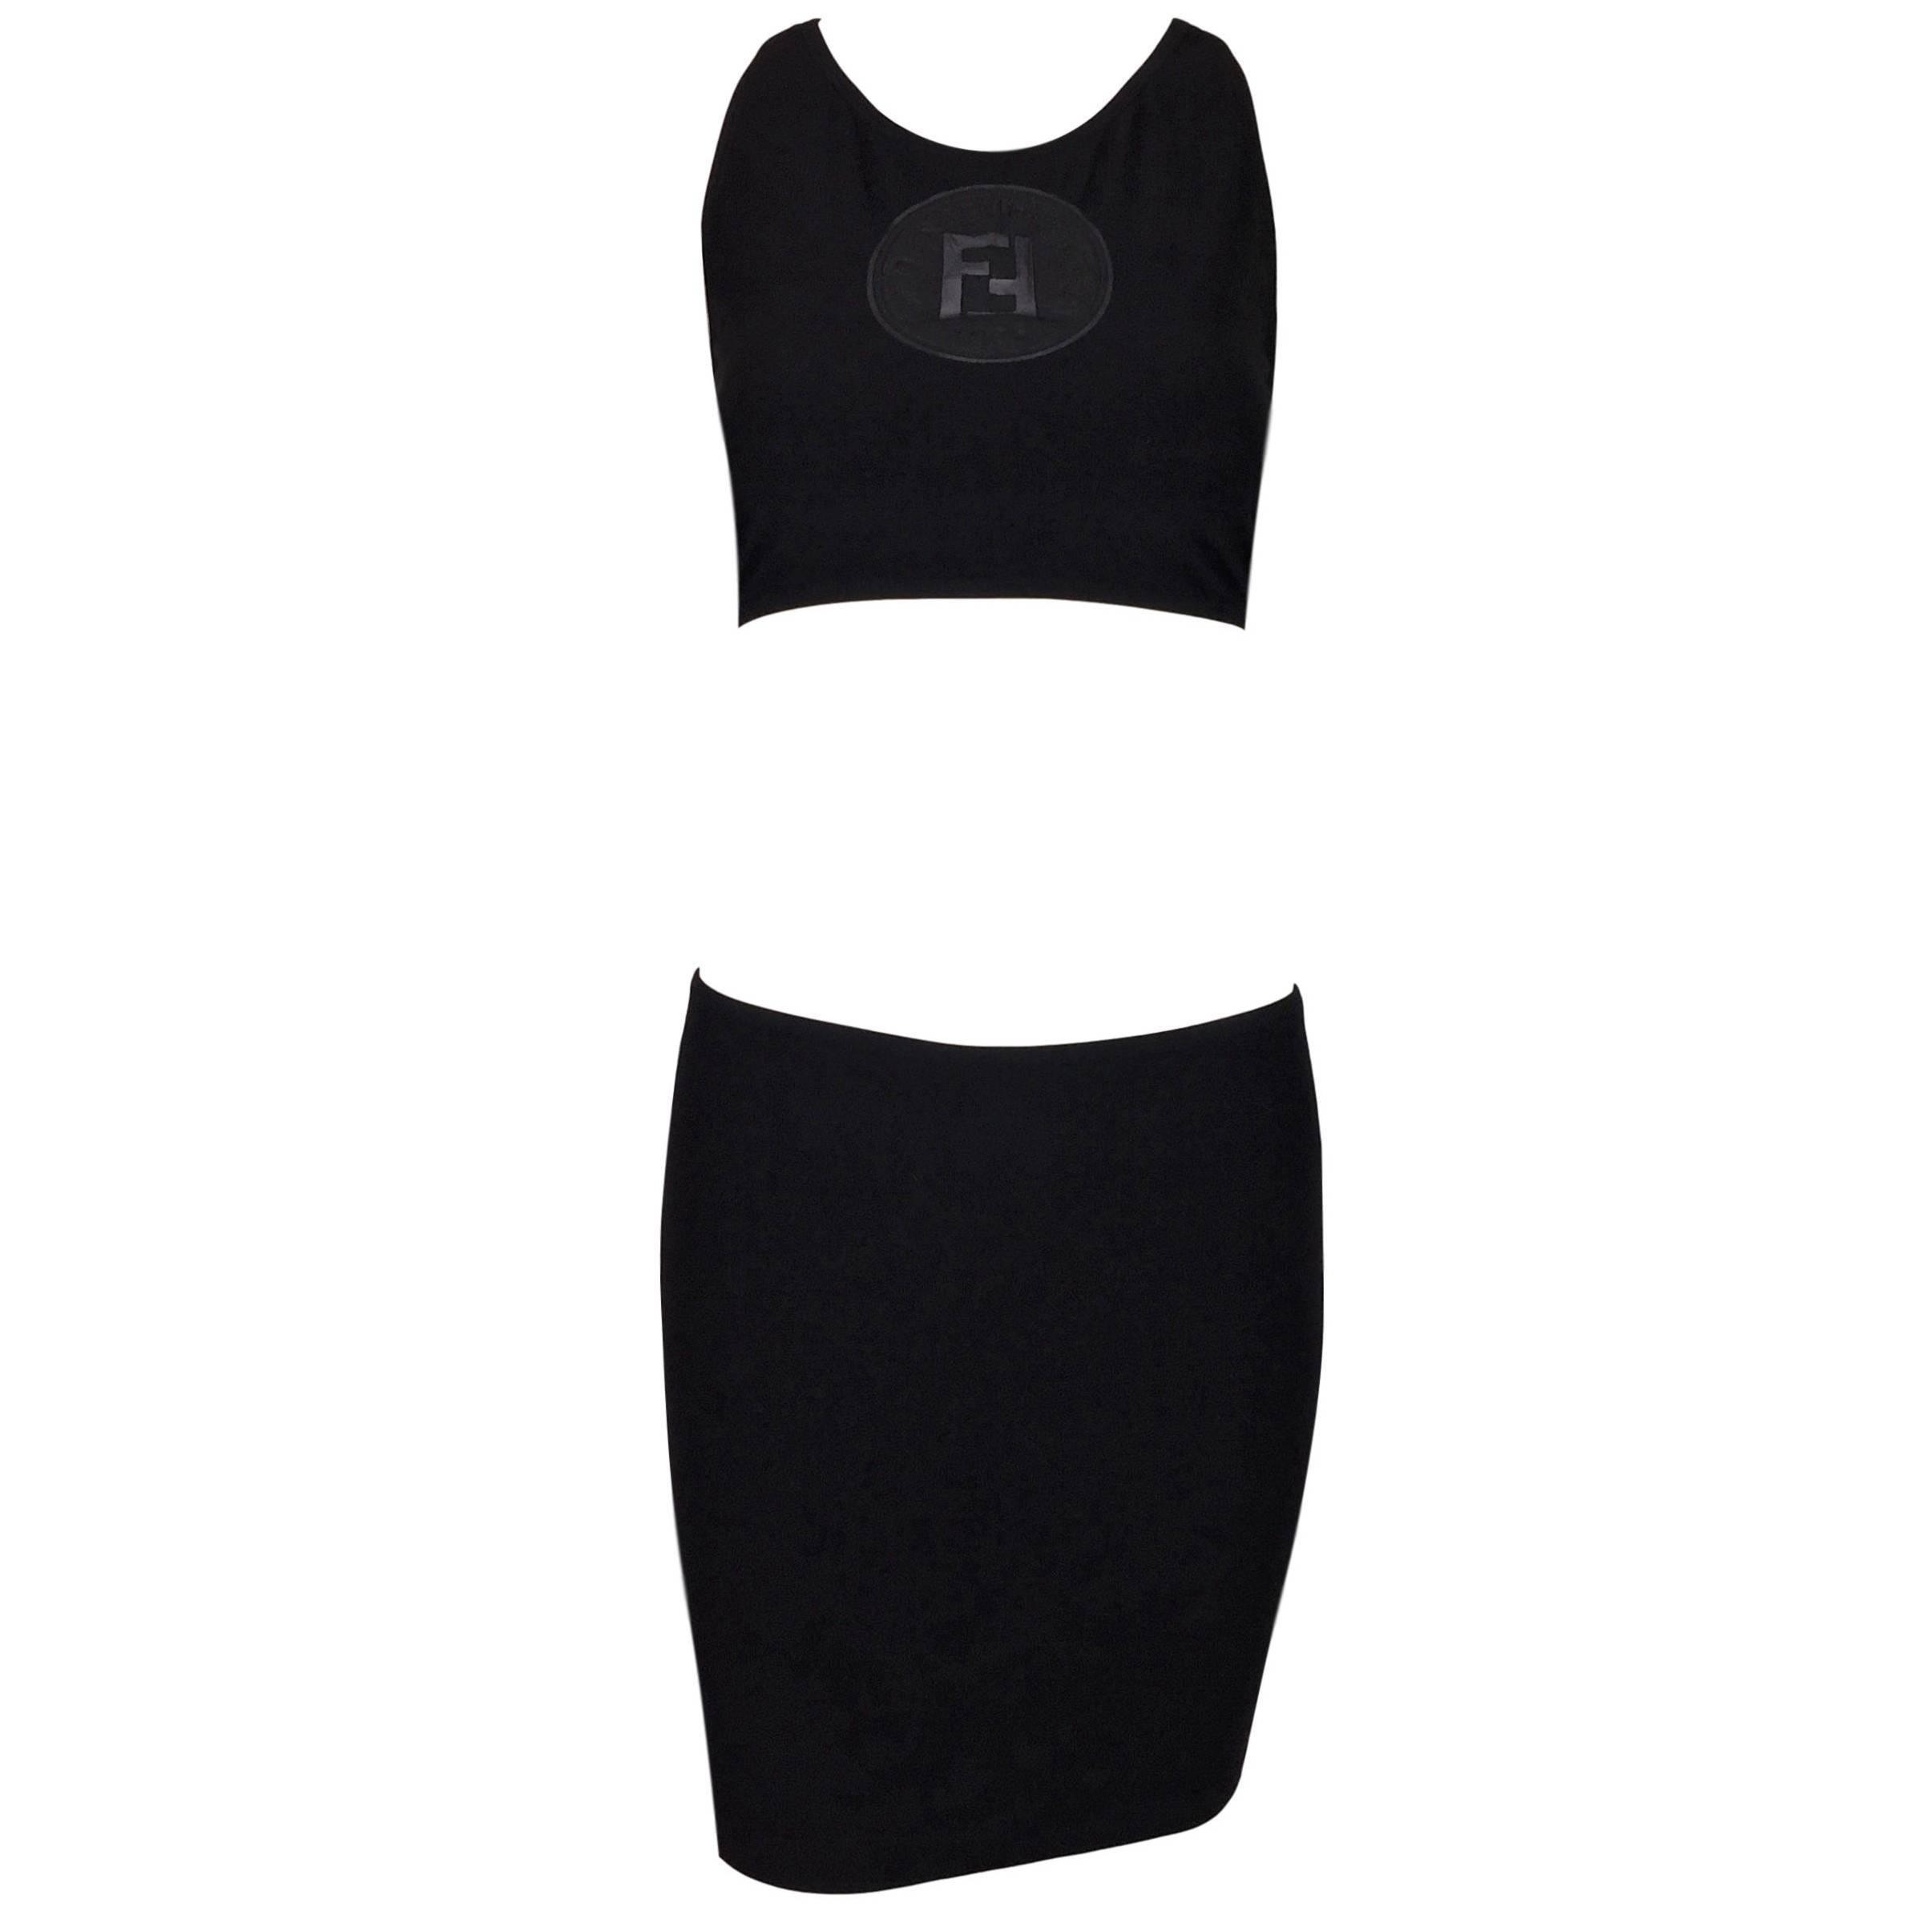 35baf3dccc NWT 1990's Fendi Black Sheer Monogram Logo Crop Top and Mini Skirt at  1stdibs